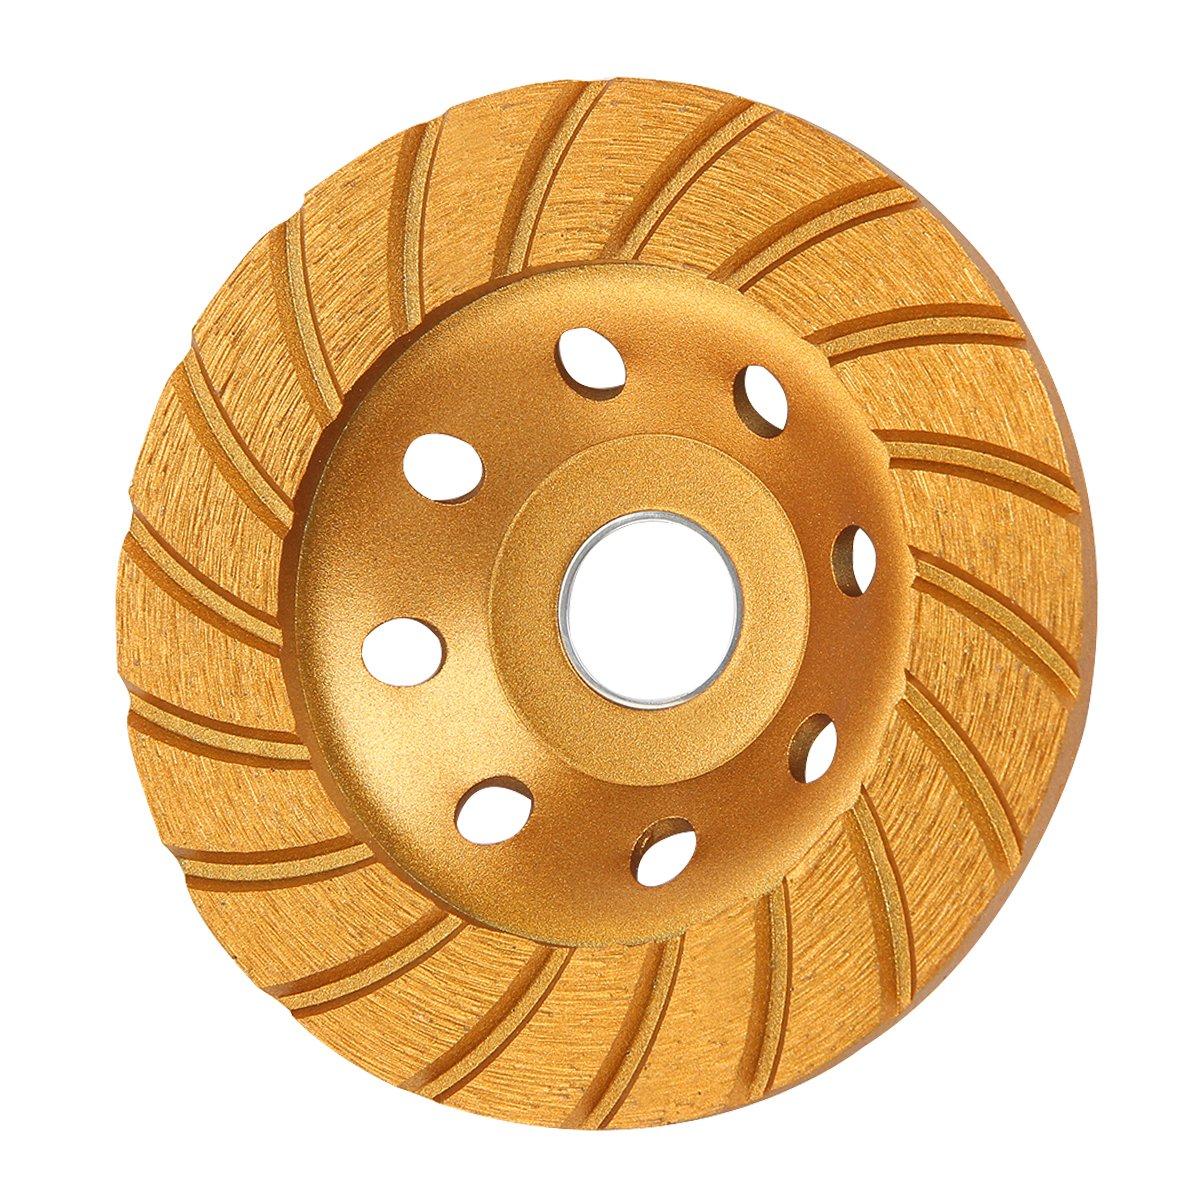 KSEIBI 644052 Super Turbo Diamond Cup wheel 4-1/2 Inch (115 mm) by KSEIBI